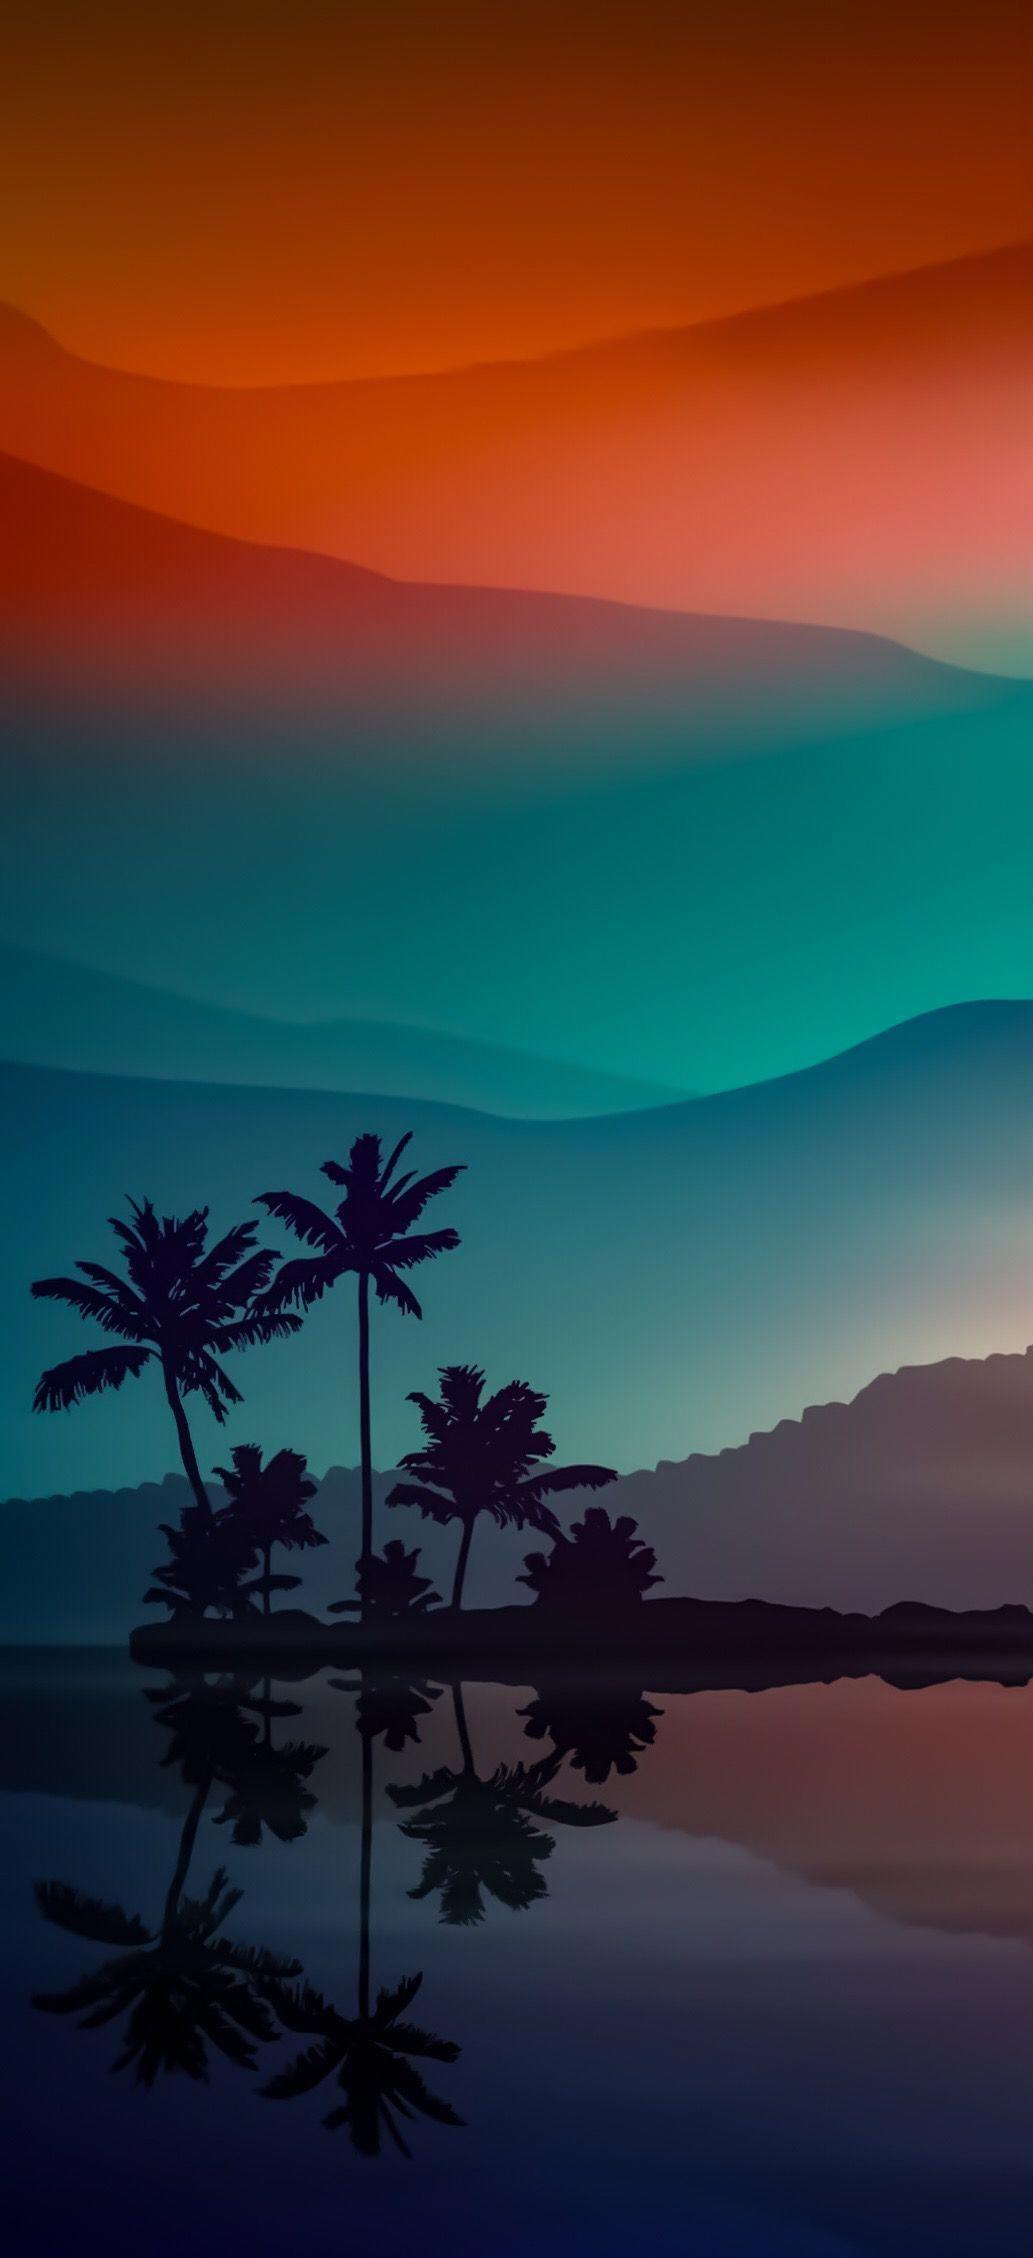 Iphone Vs Android Meme Laptopnews Id 9917974741 Favouritesmartphone Landscape Wallpaper Scenery Wallpaper Minimalist Wallpaper